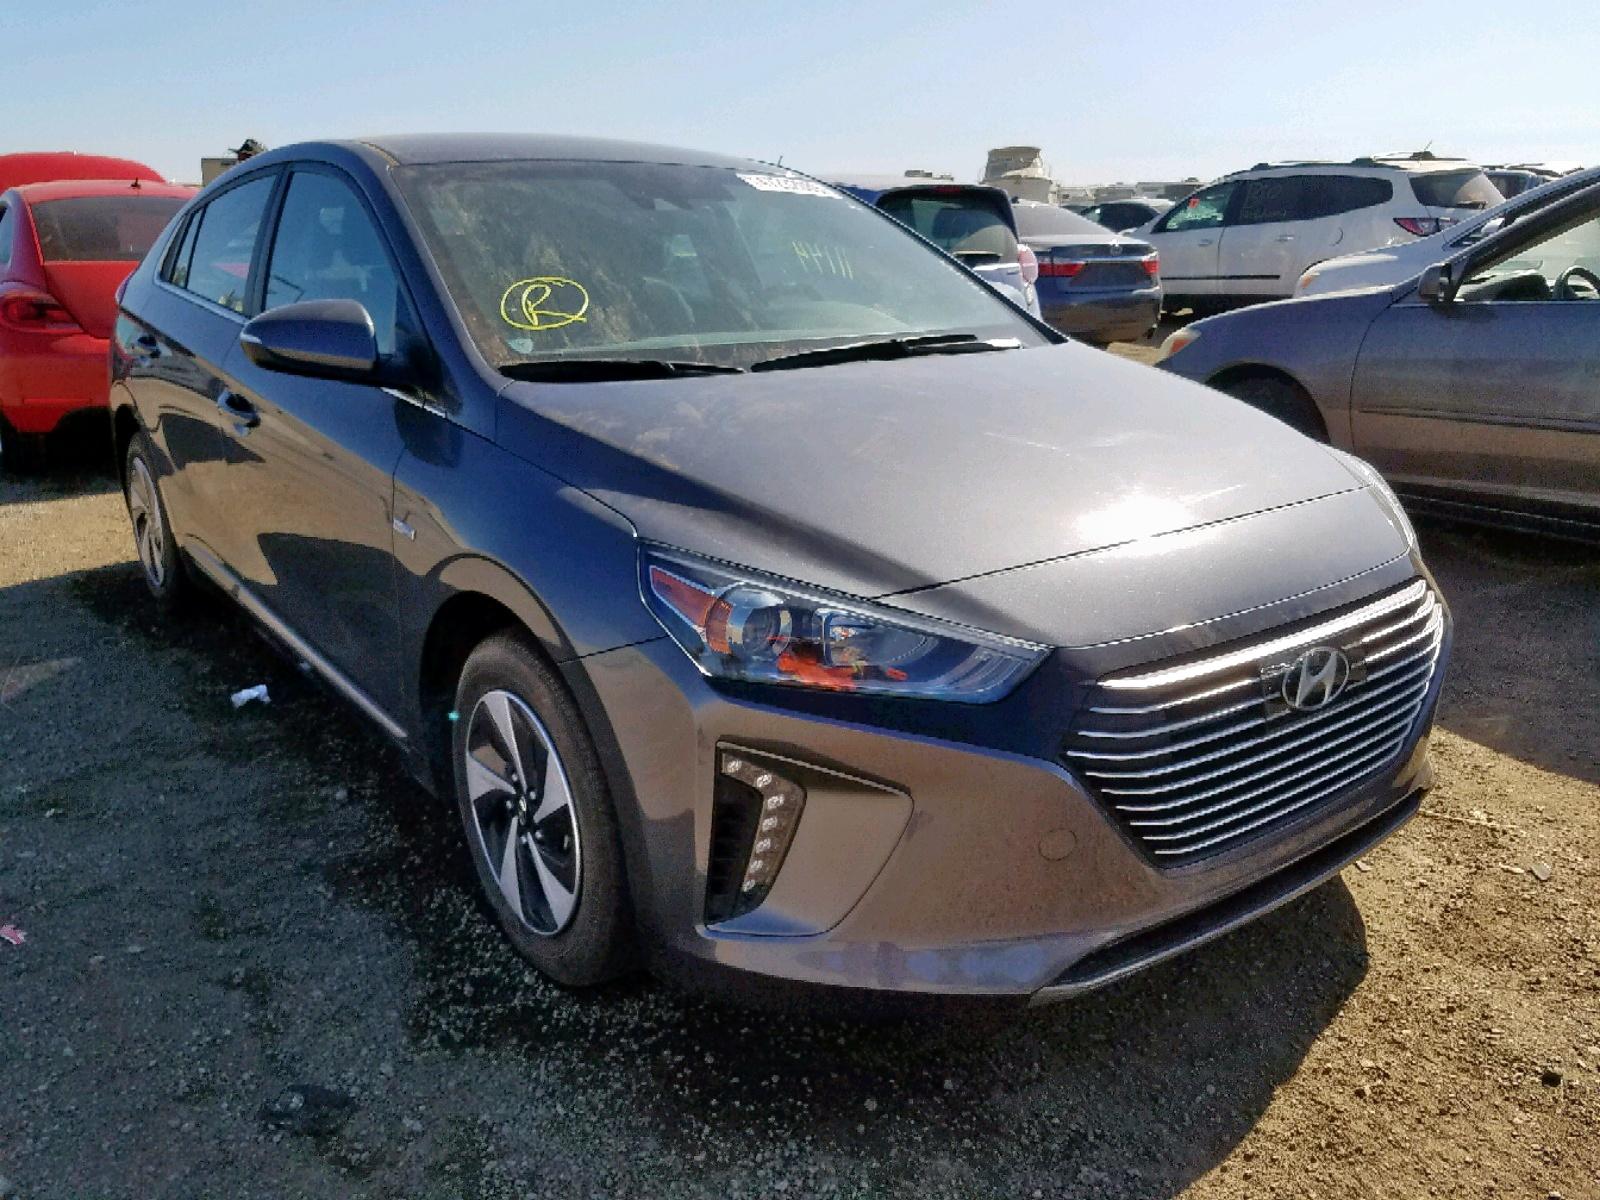 KMHC75LC2HU028247 - 2017 Hyundai Ioniq Sel 1.6L Left View